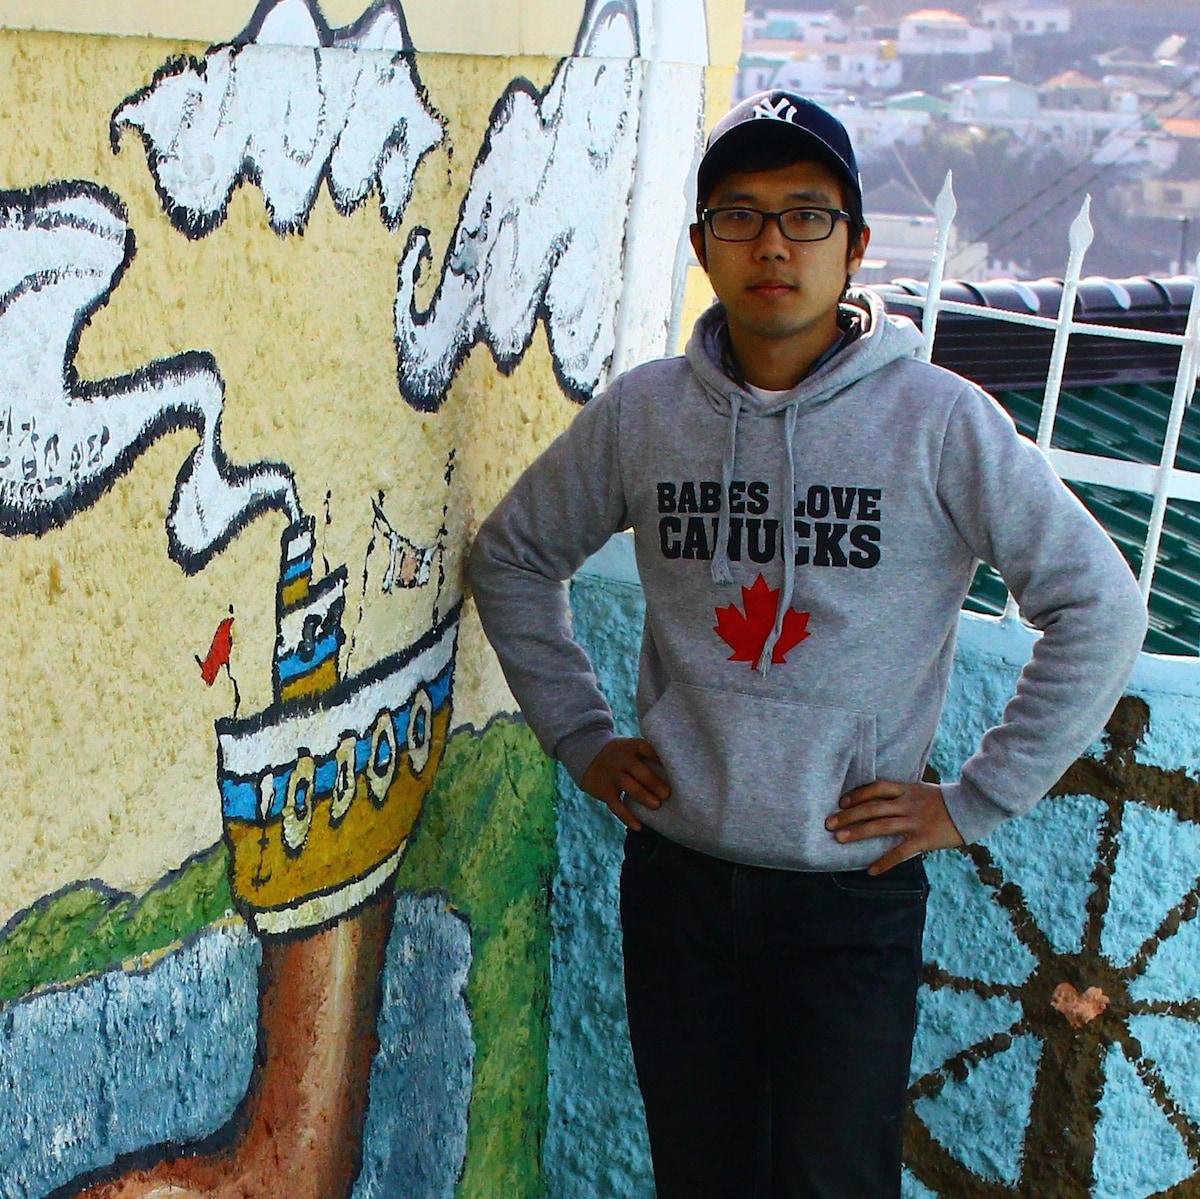 Dae-Hwan from Mapo-gu